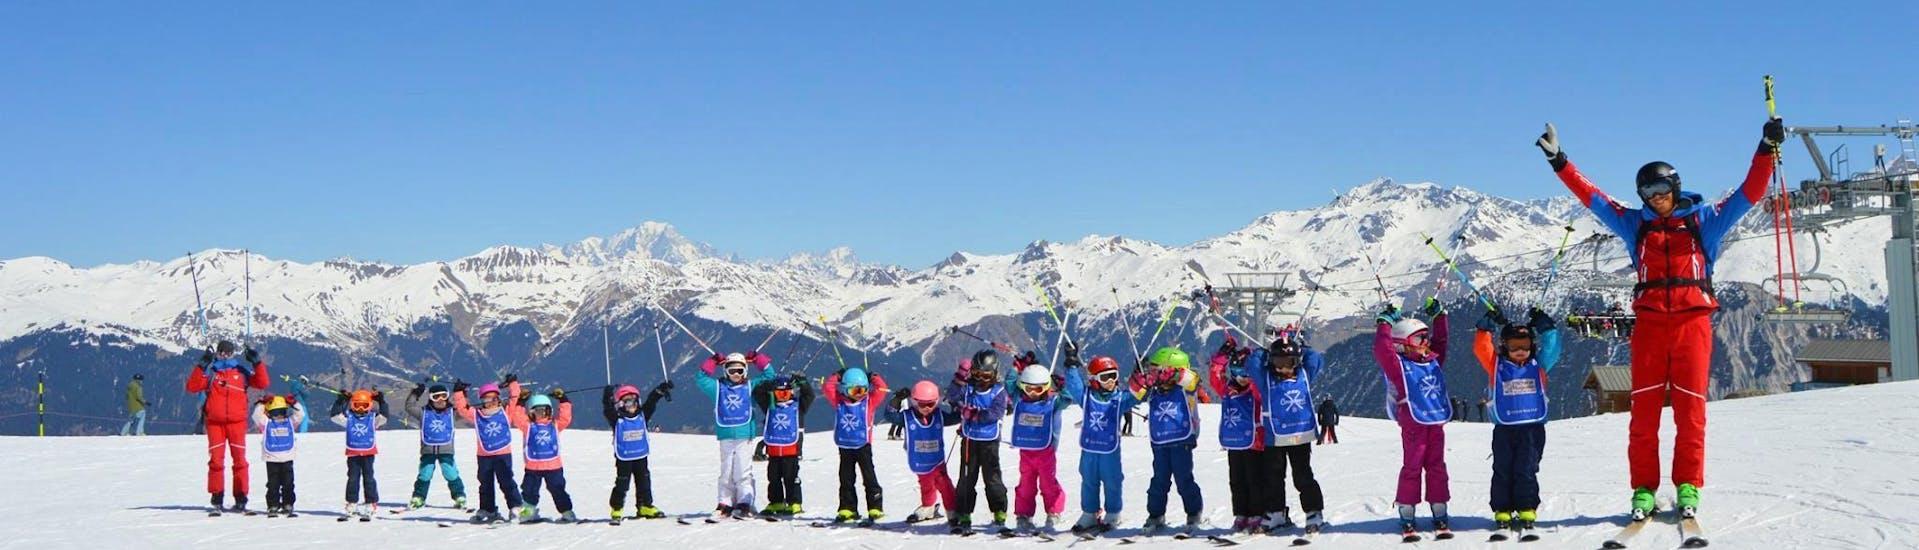 kids-ski-lessons-super-7-esf-courchevel-village-hero